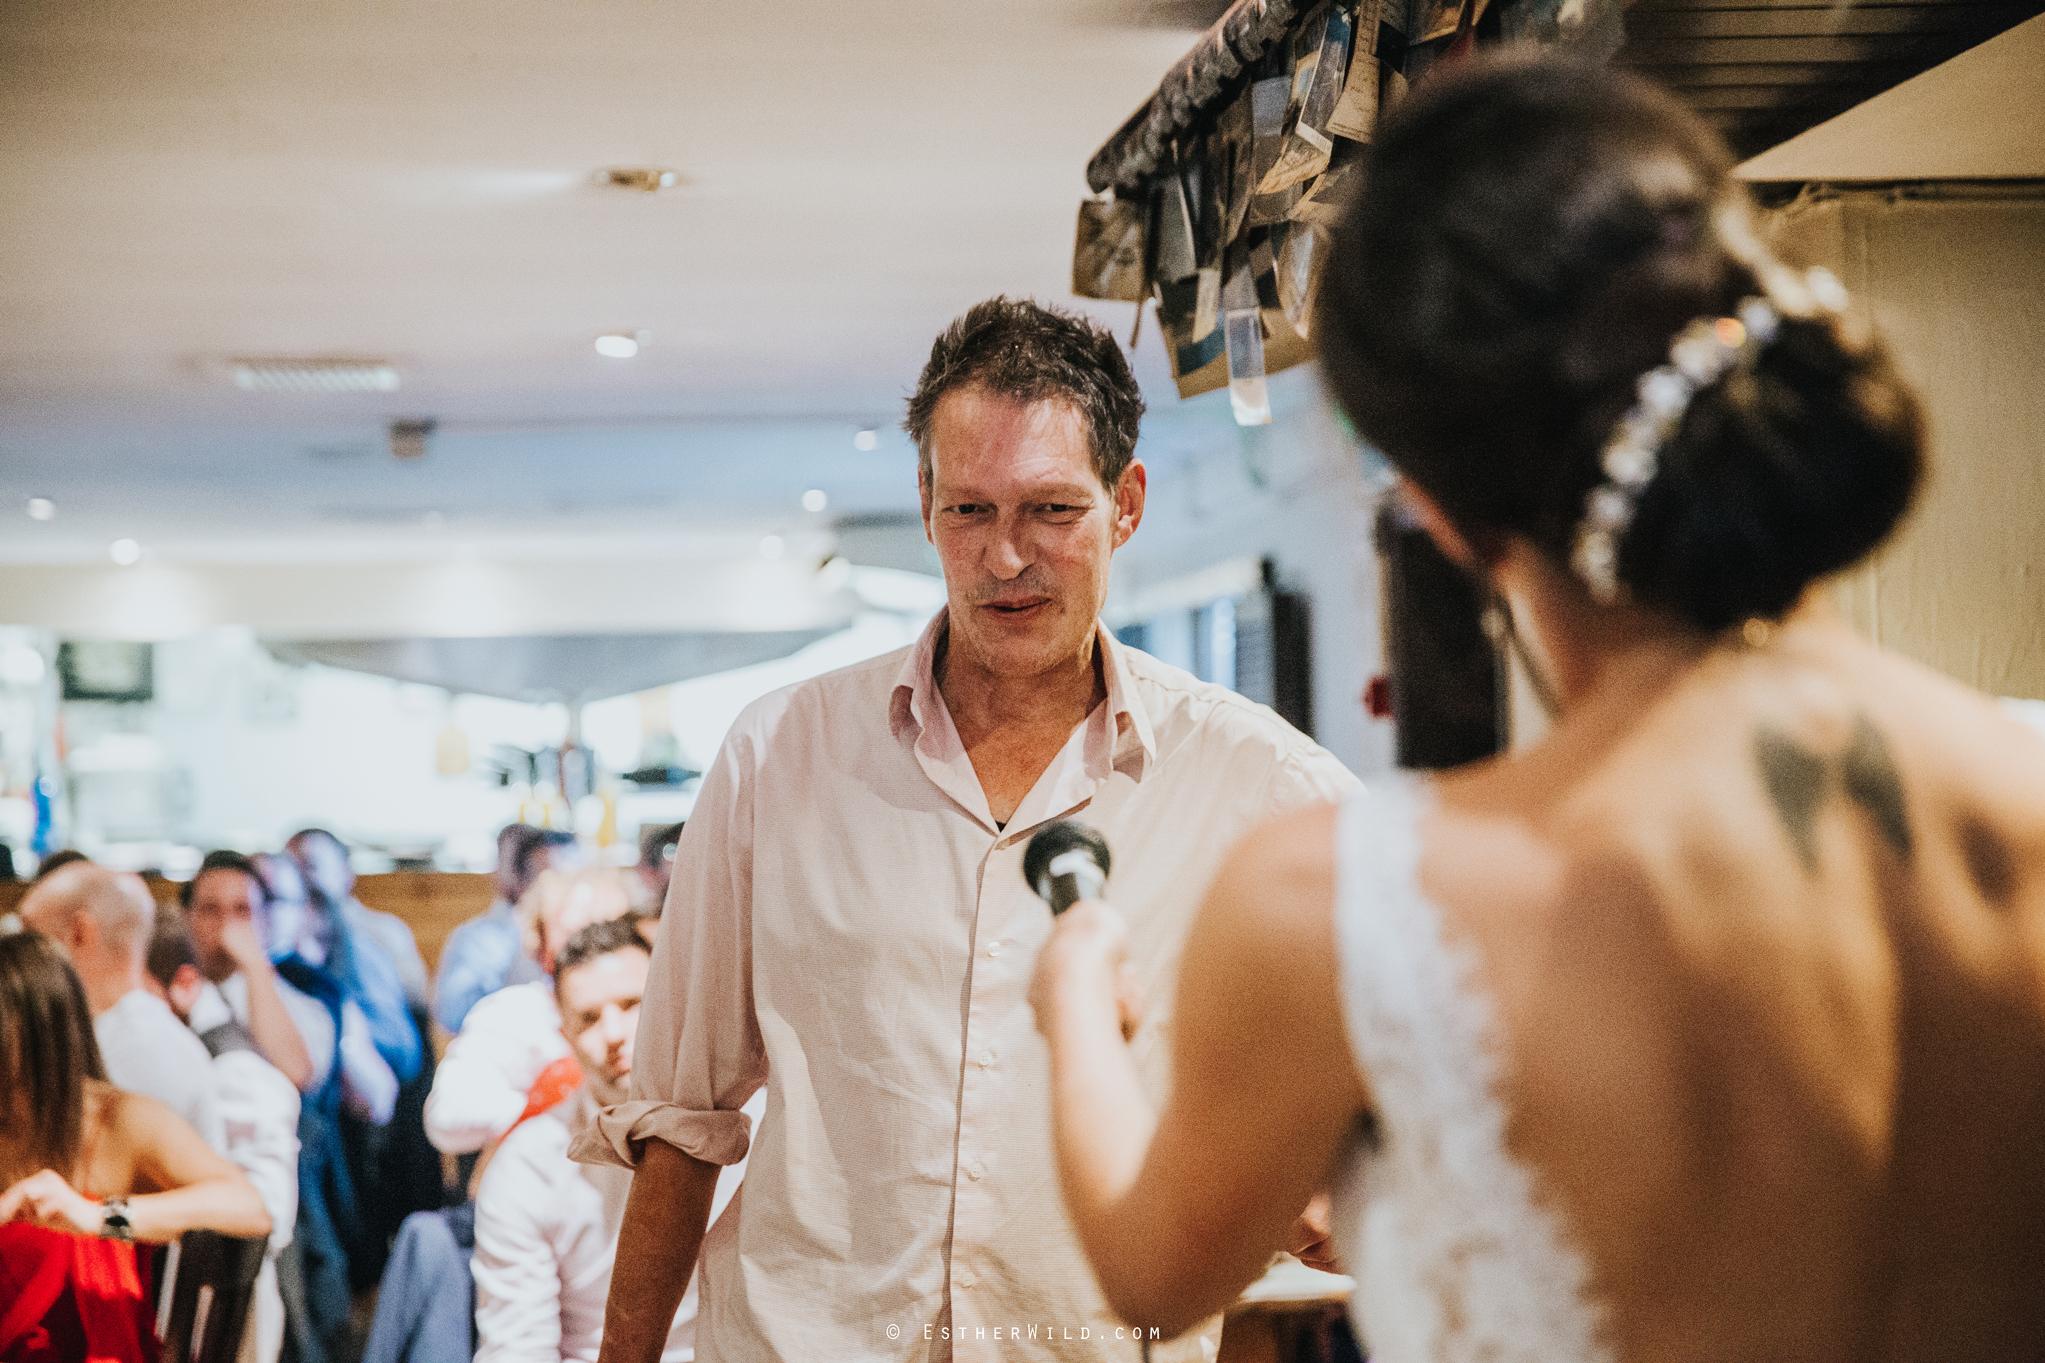 Islington_Town_Hall_Wedding_London_Photographer_Esther_Wild_IMG_5778.jpg